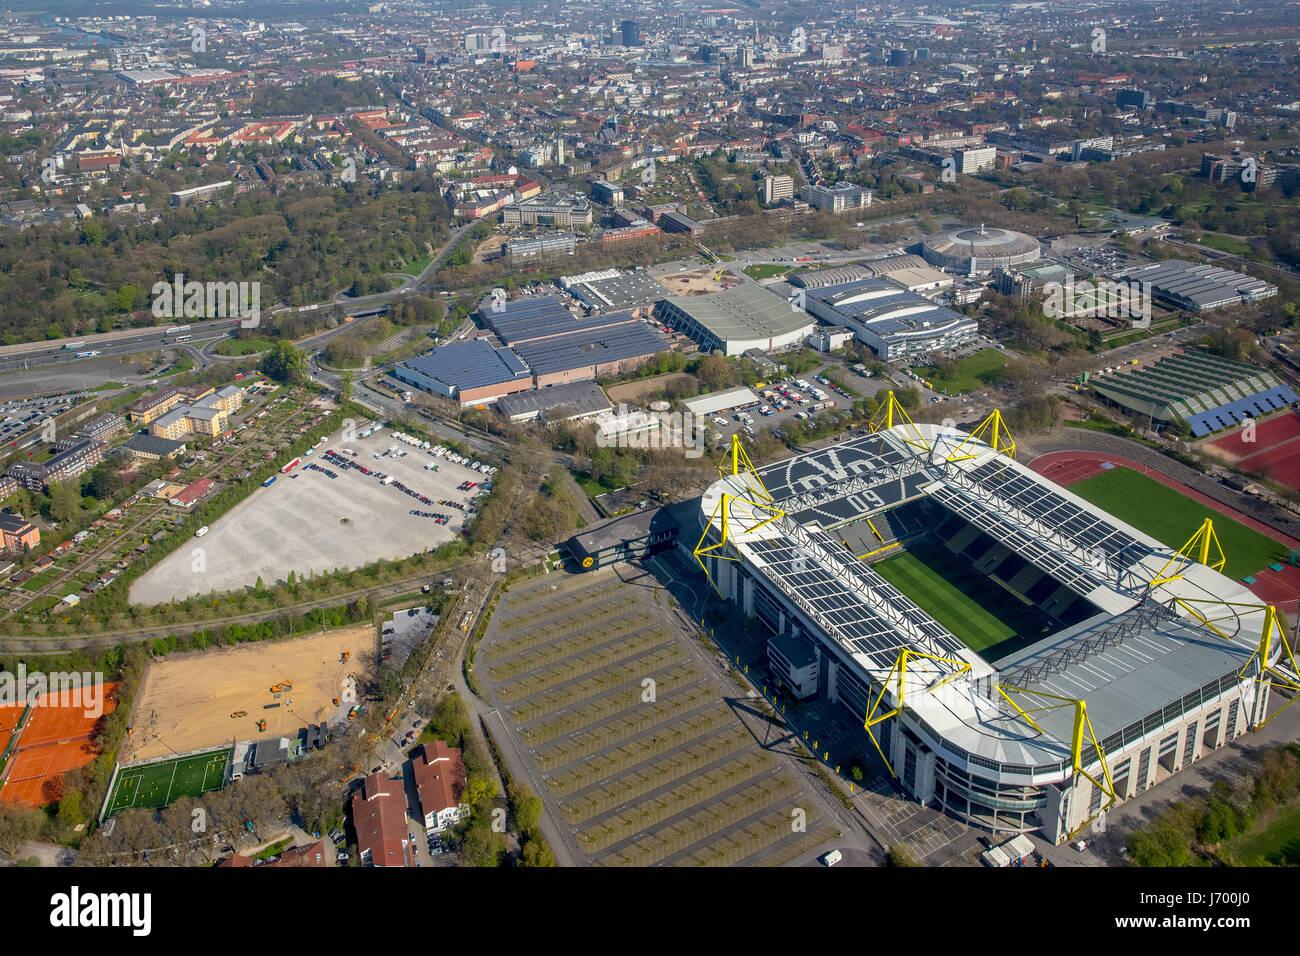 BVB Stadium, football stadium, soccer, Westfalenhallen, Dortmund fair, exhibition grounds, german premier league, - Stock Image